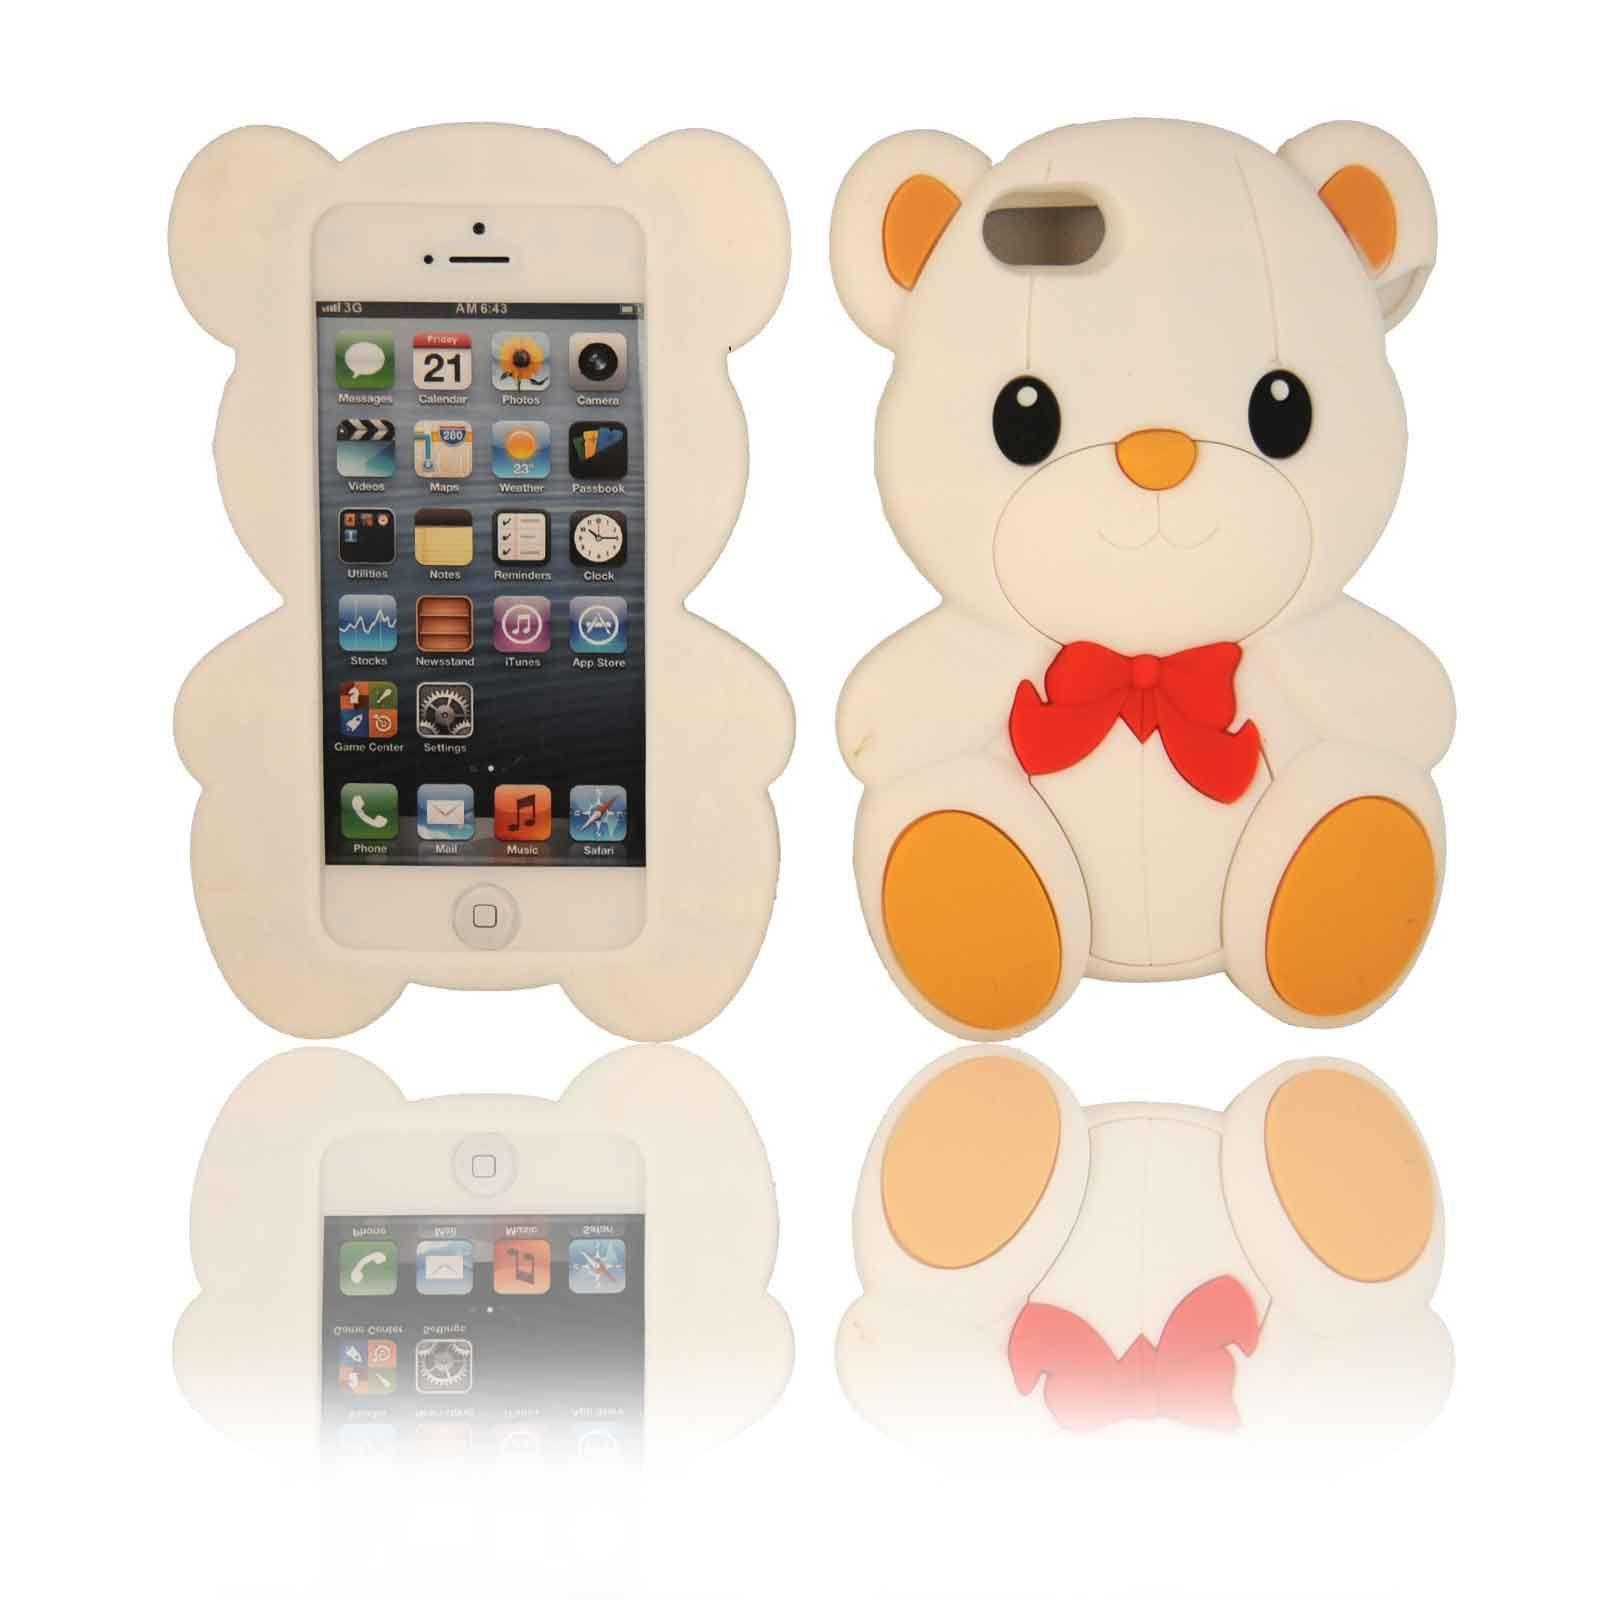 Cute Iphone 5c Cases - Google Search